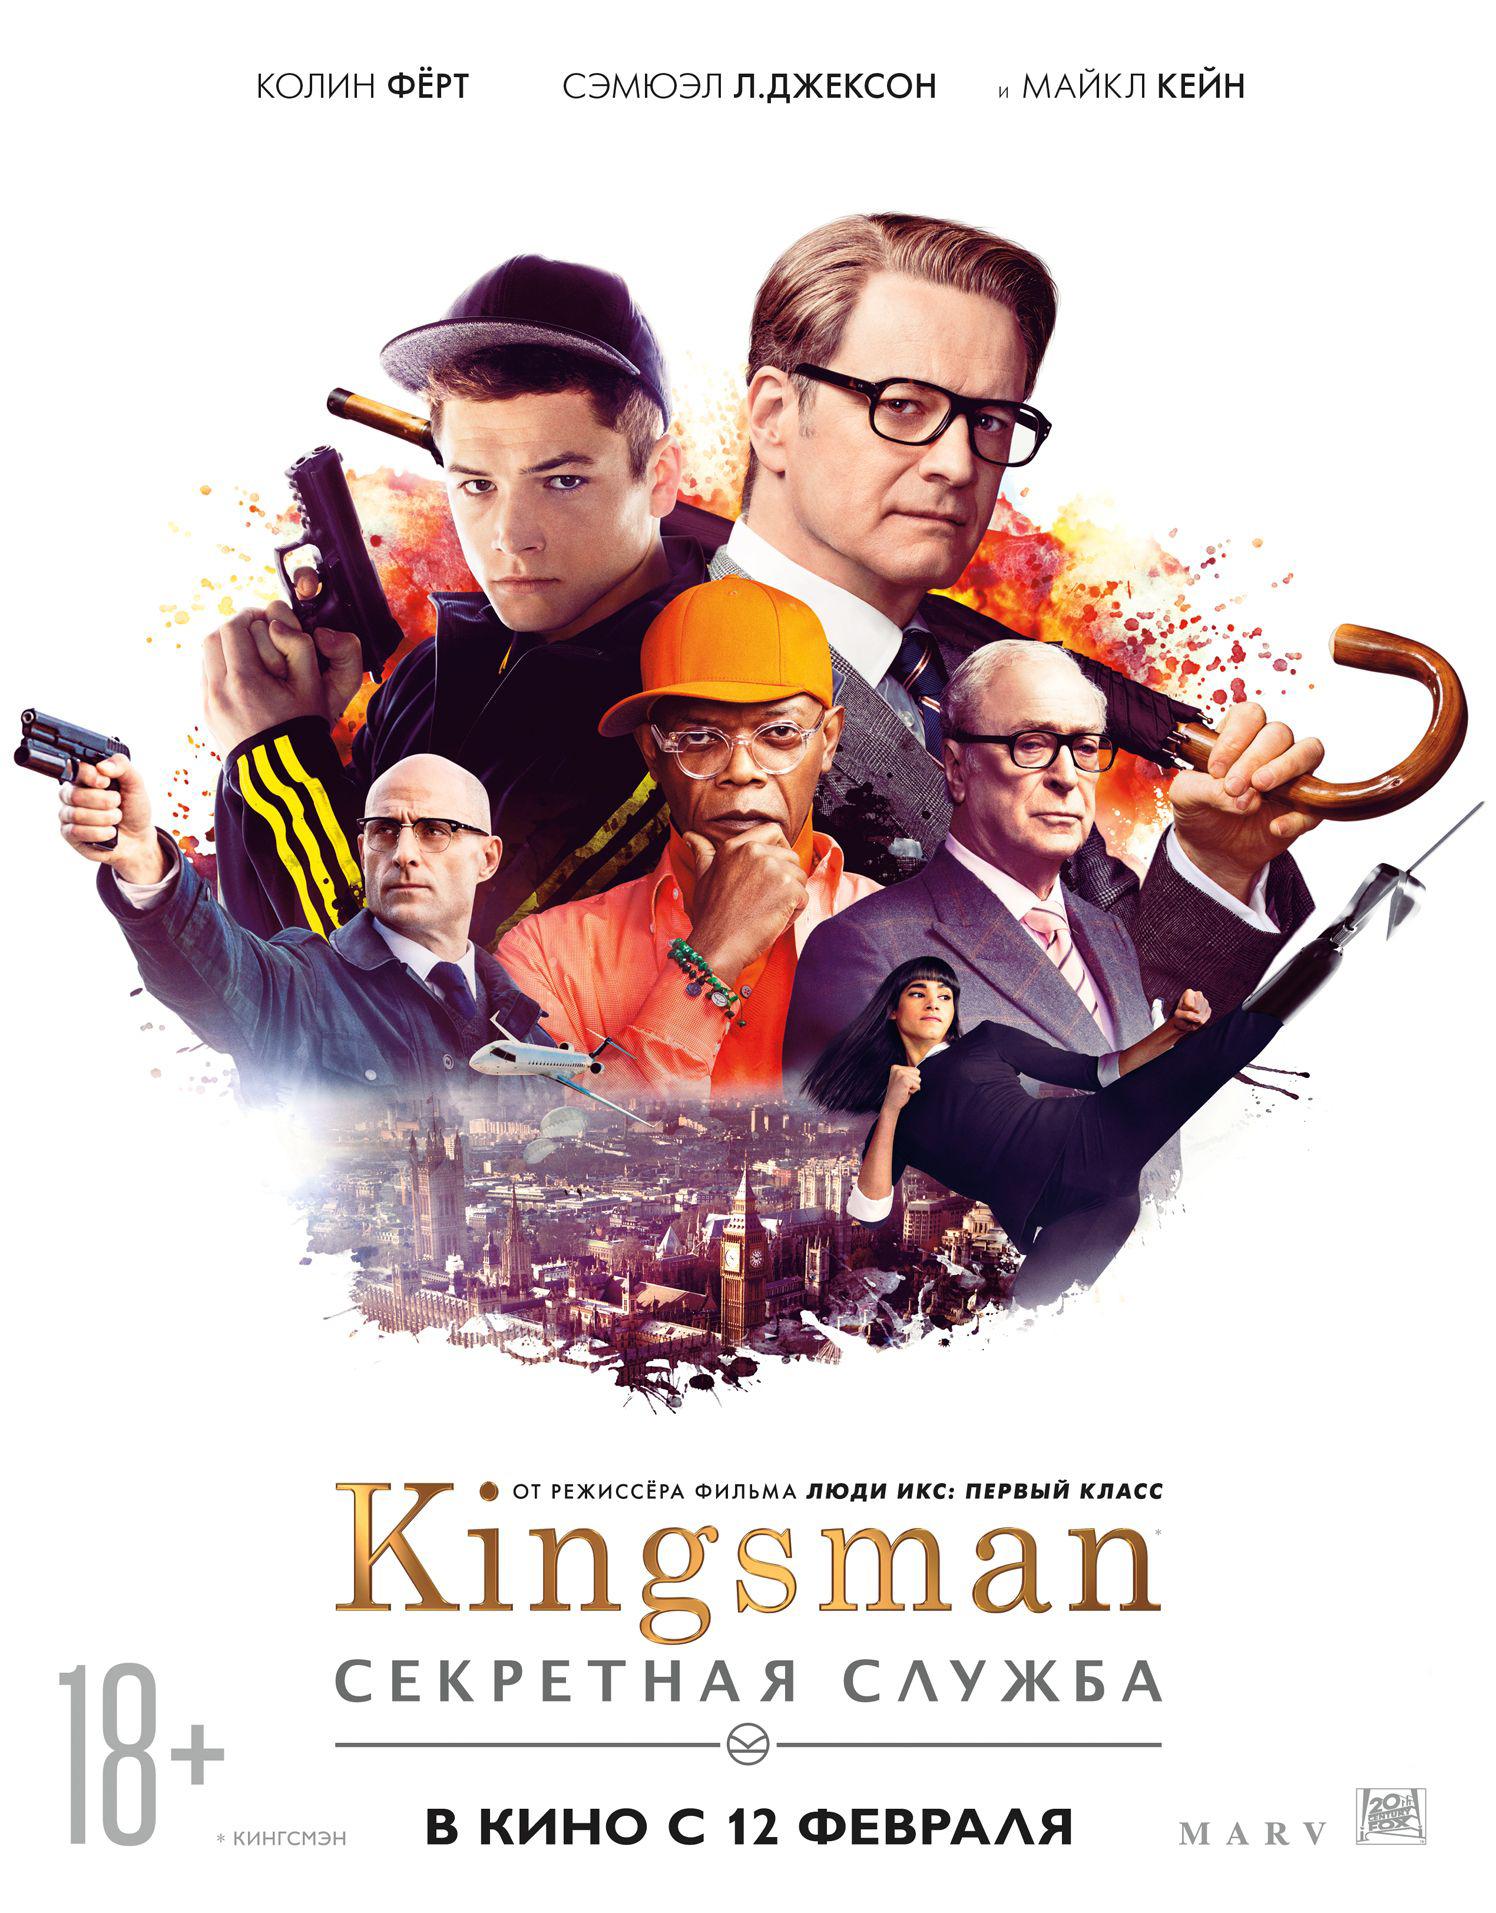 Kingsman: Секретная служба (2 15) смотреть онлайн